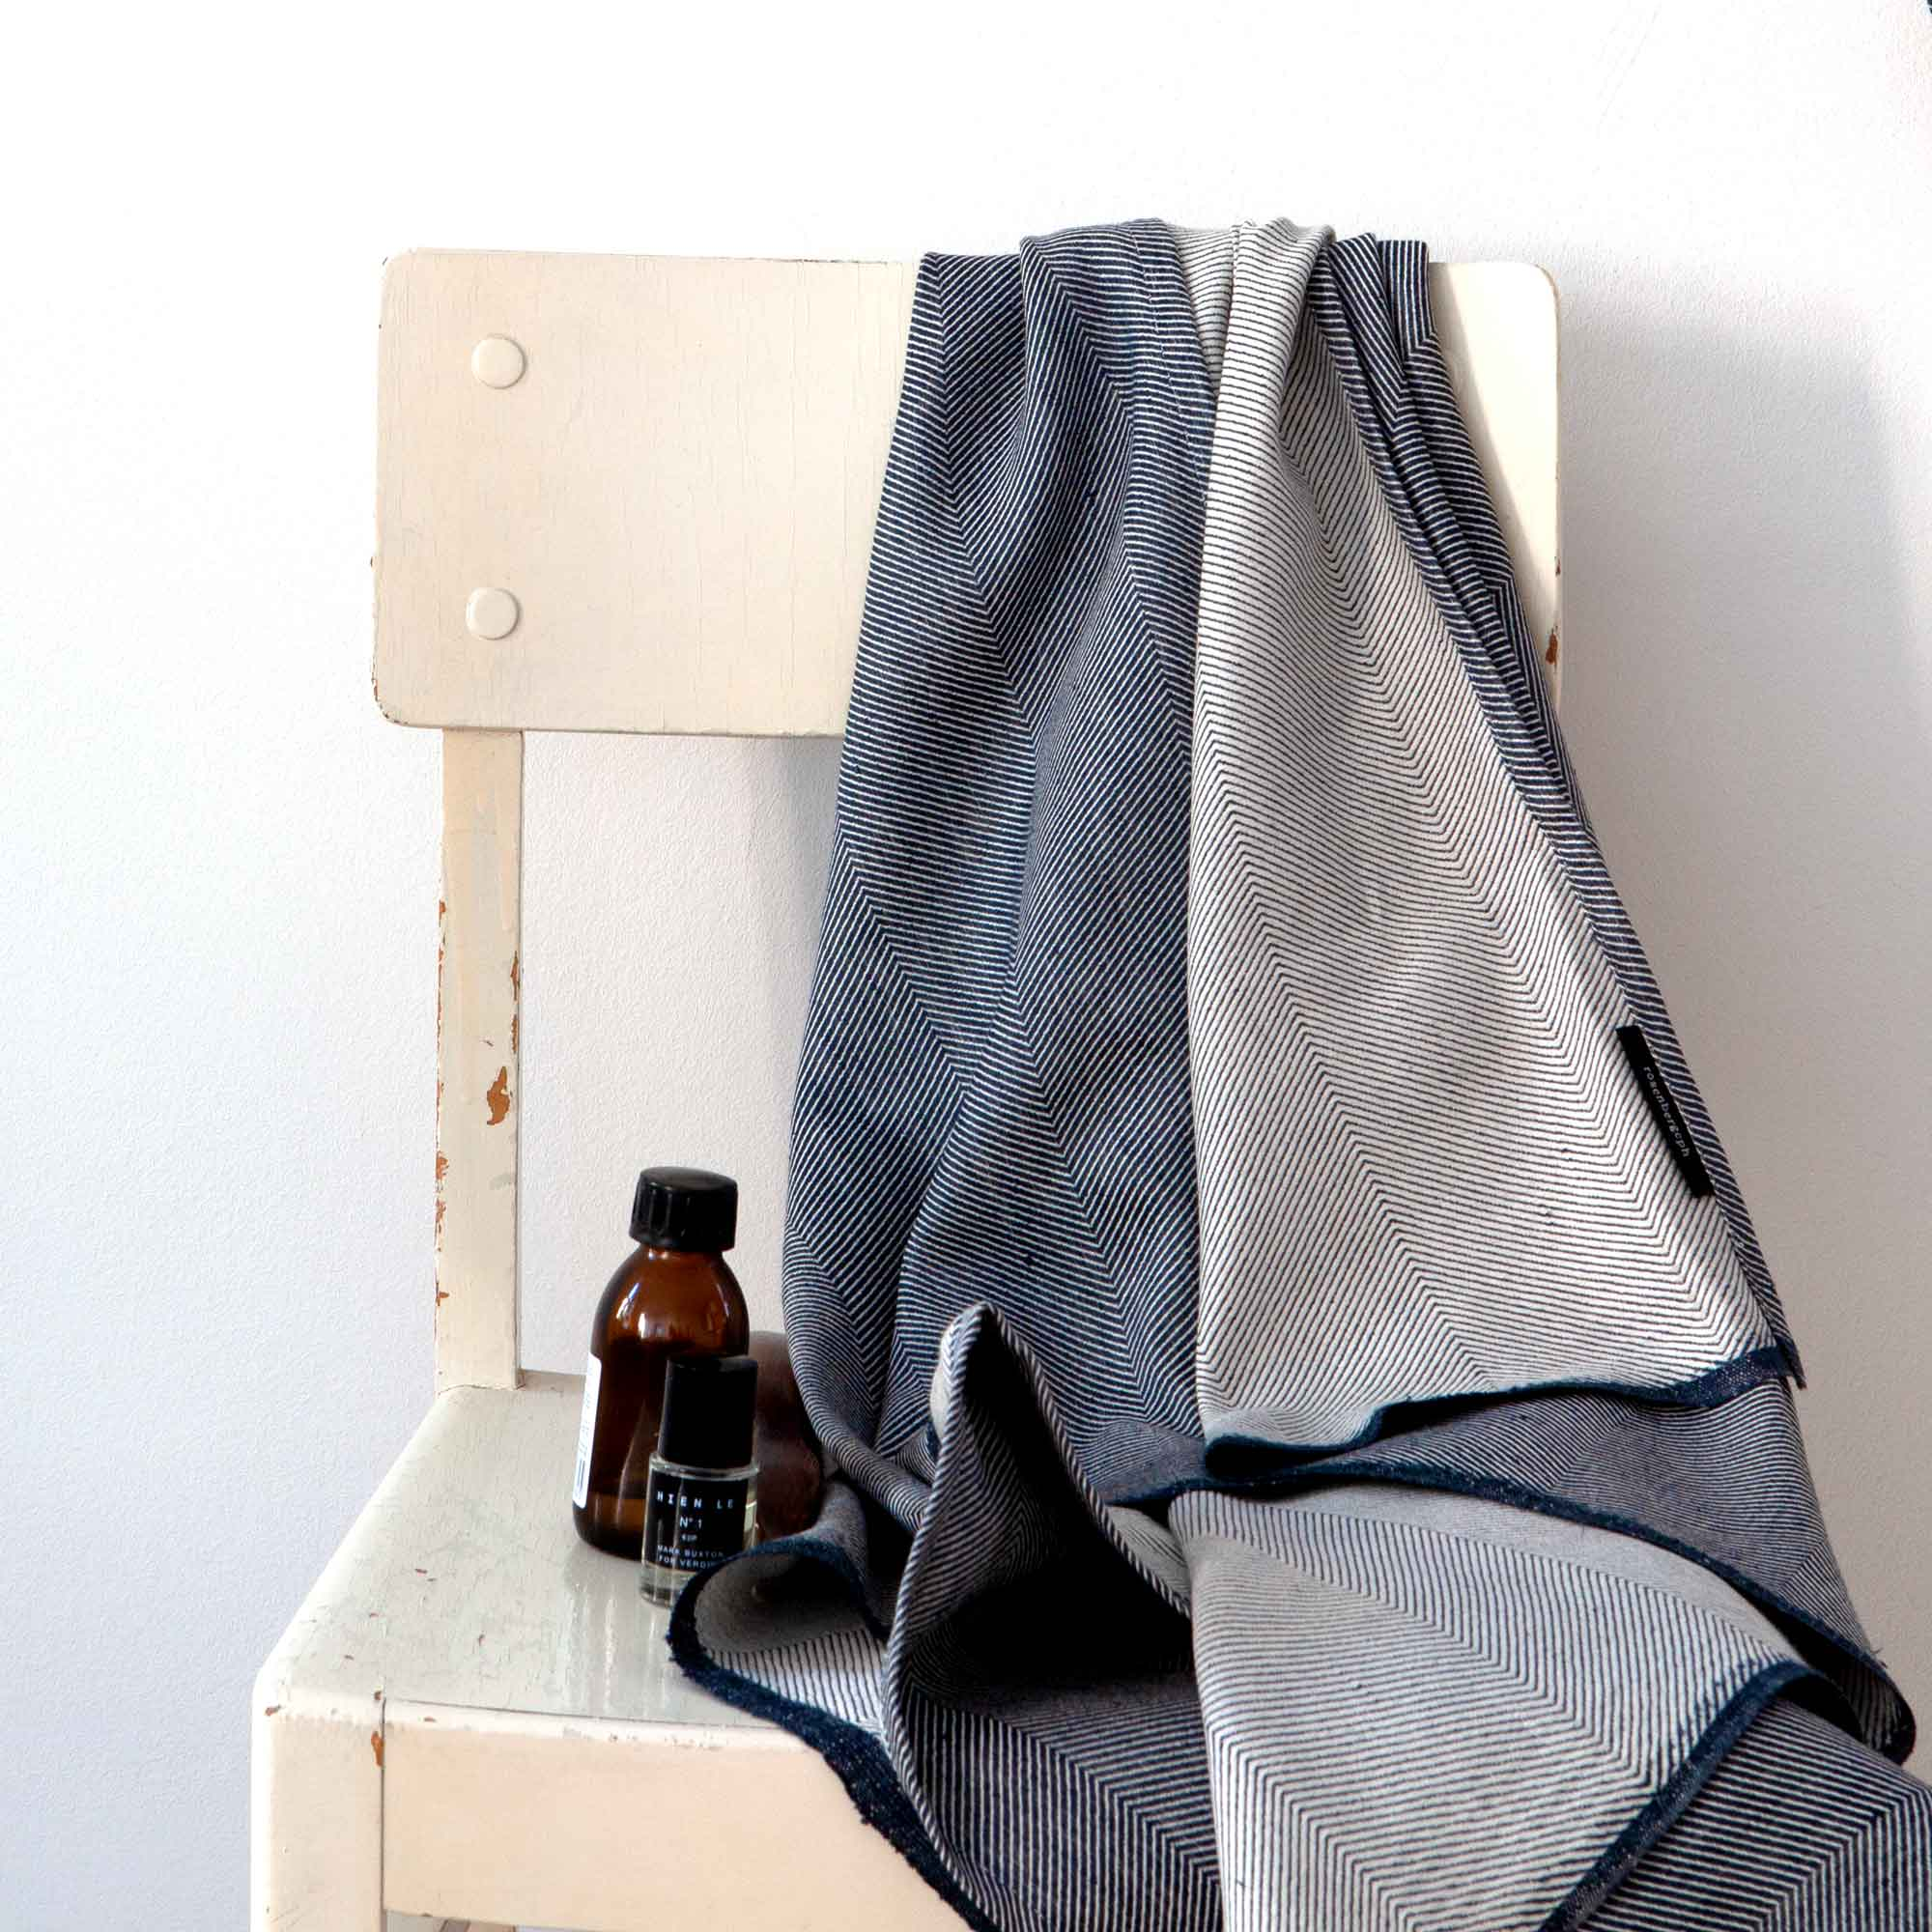 Bath towel, Indigo, linen/cotton, design by Anne Rosenberg, RosenbergCph